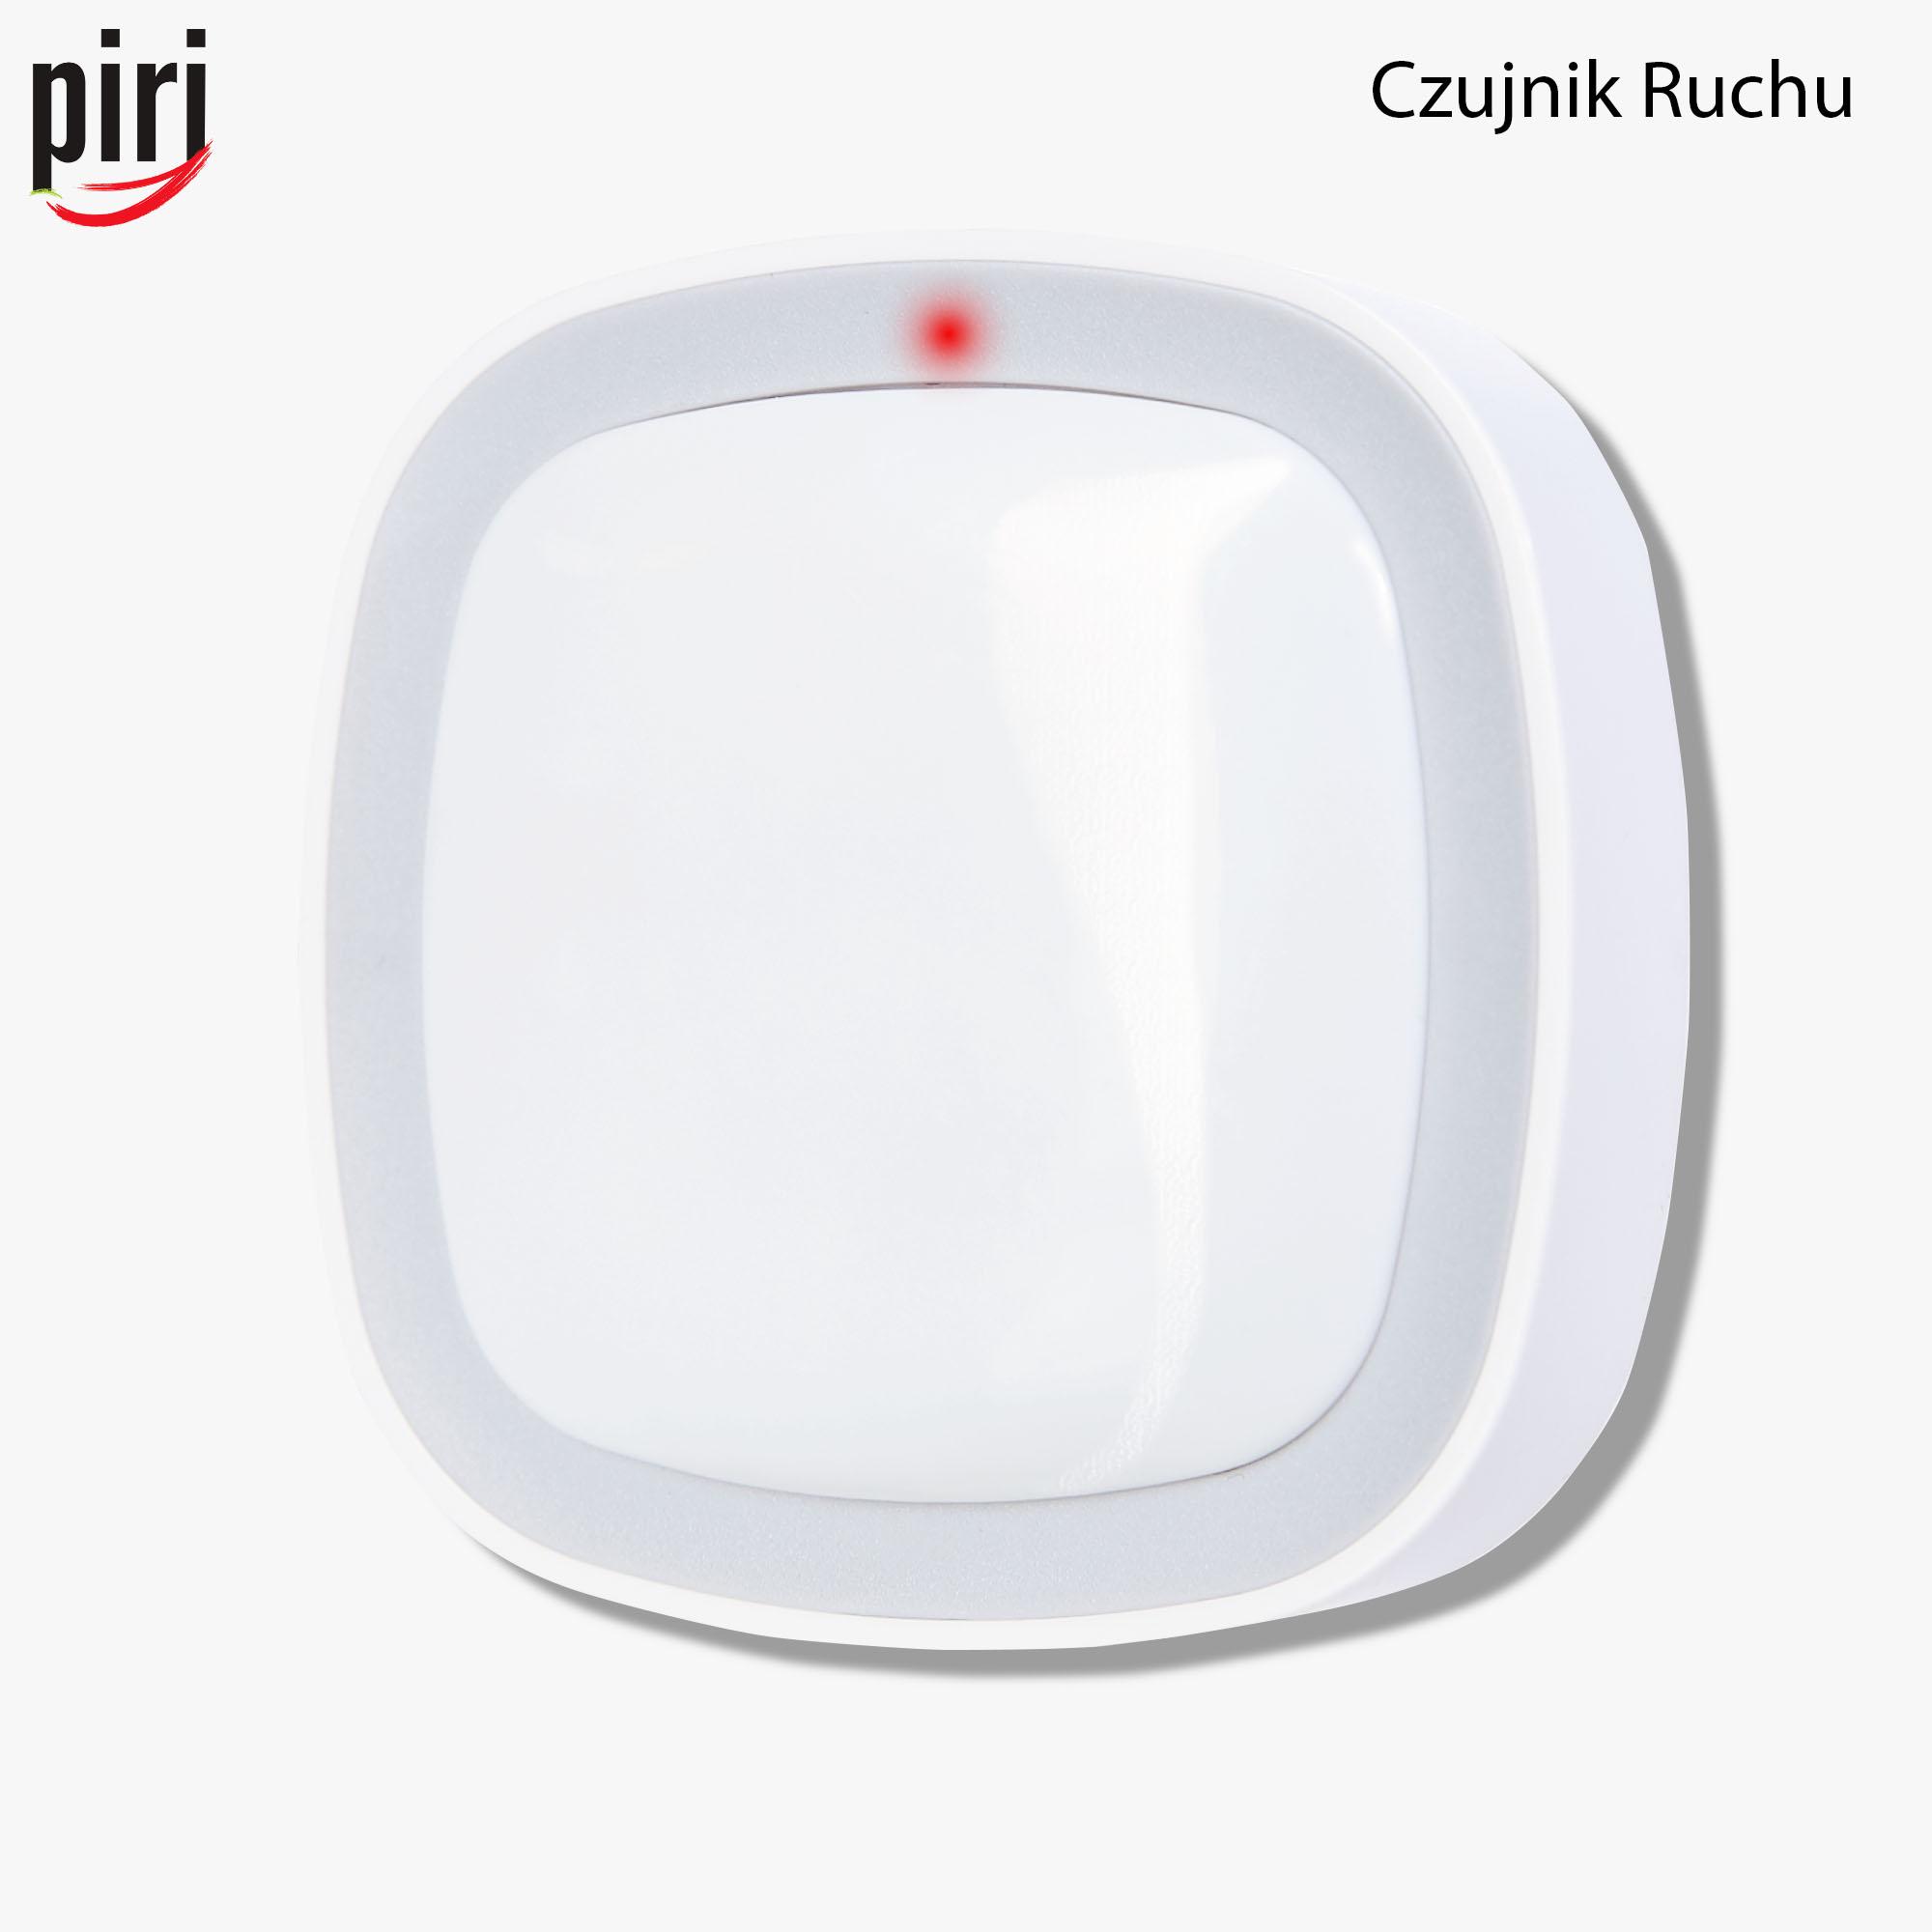 czujnik ruchu motion sensor Piri